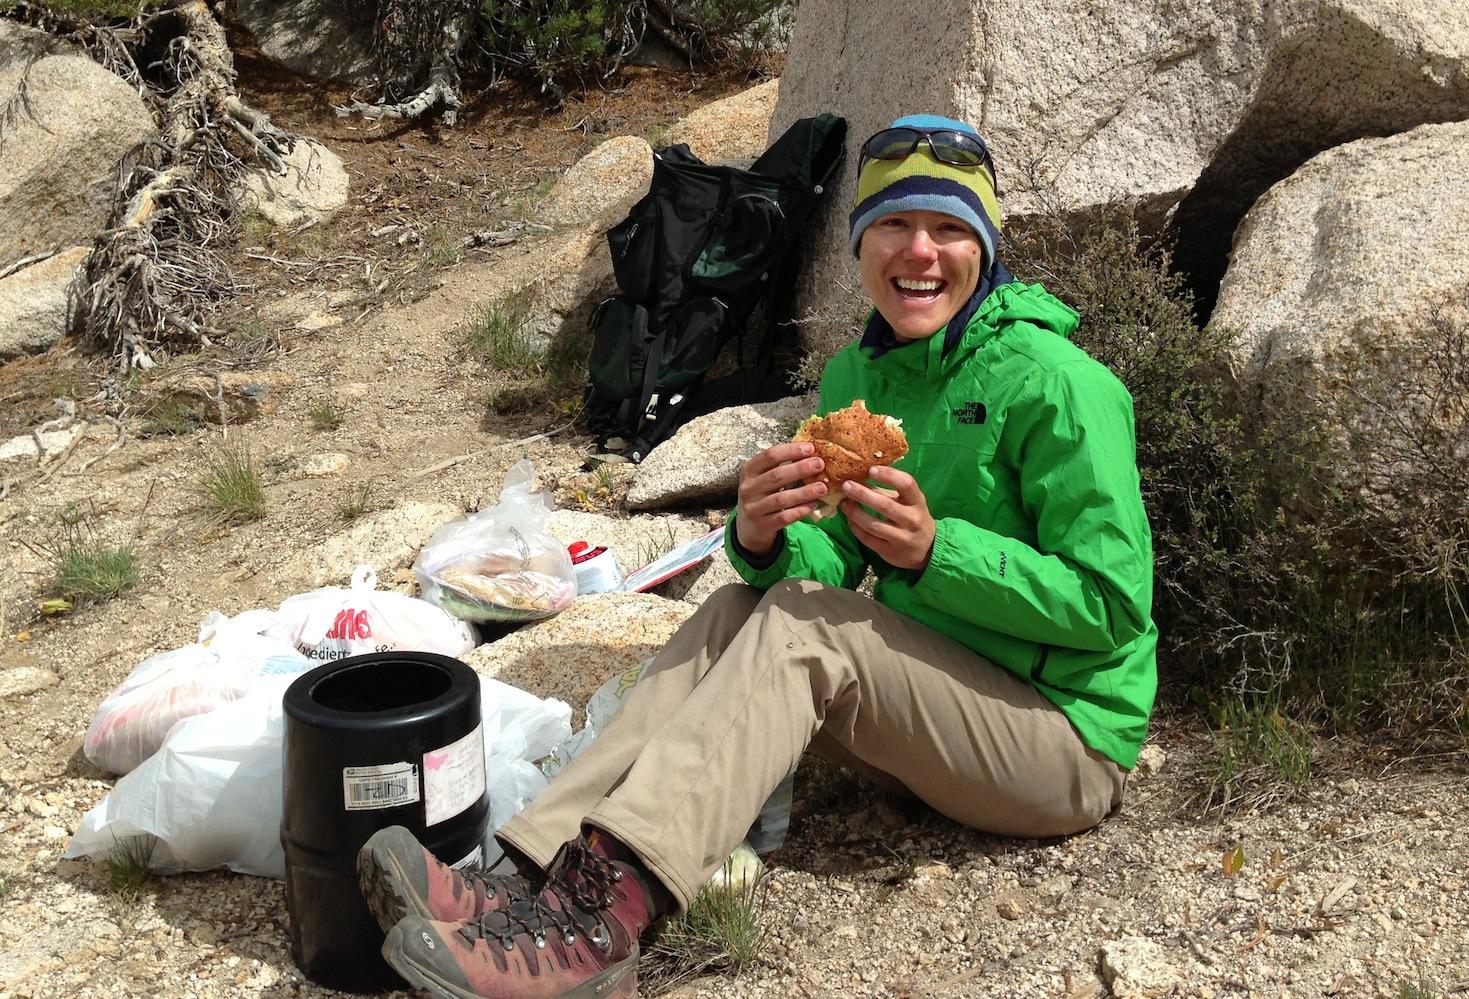 JMT: Briana enjoying her sandwich courtesy of Strider